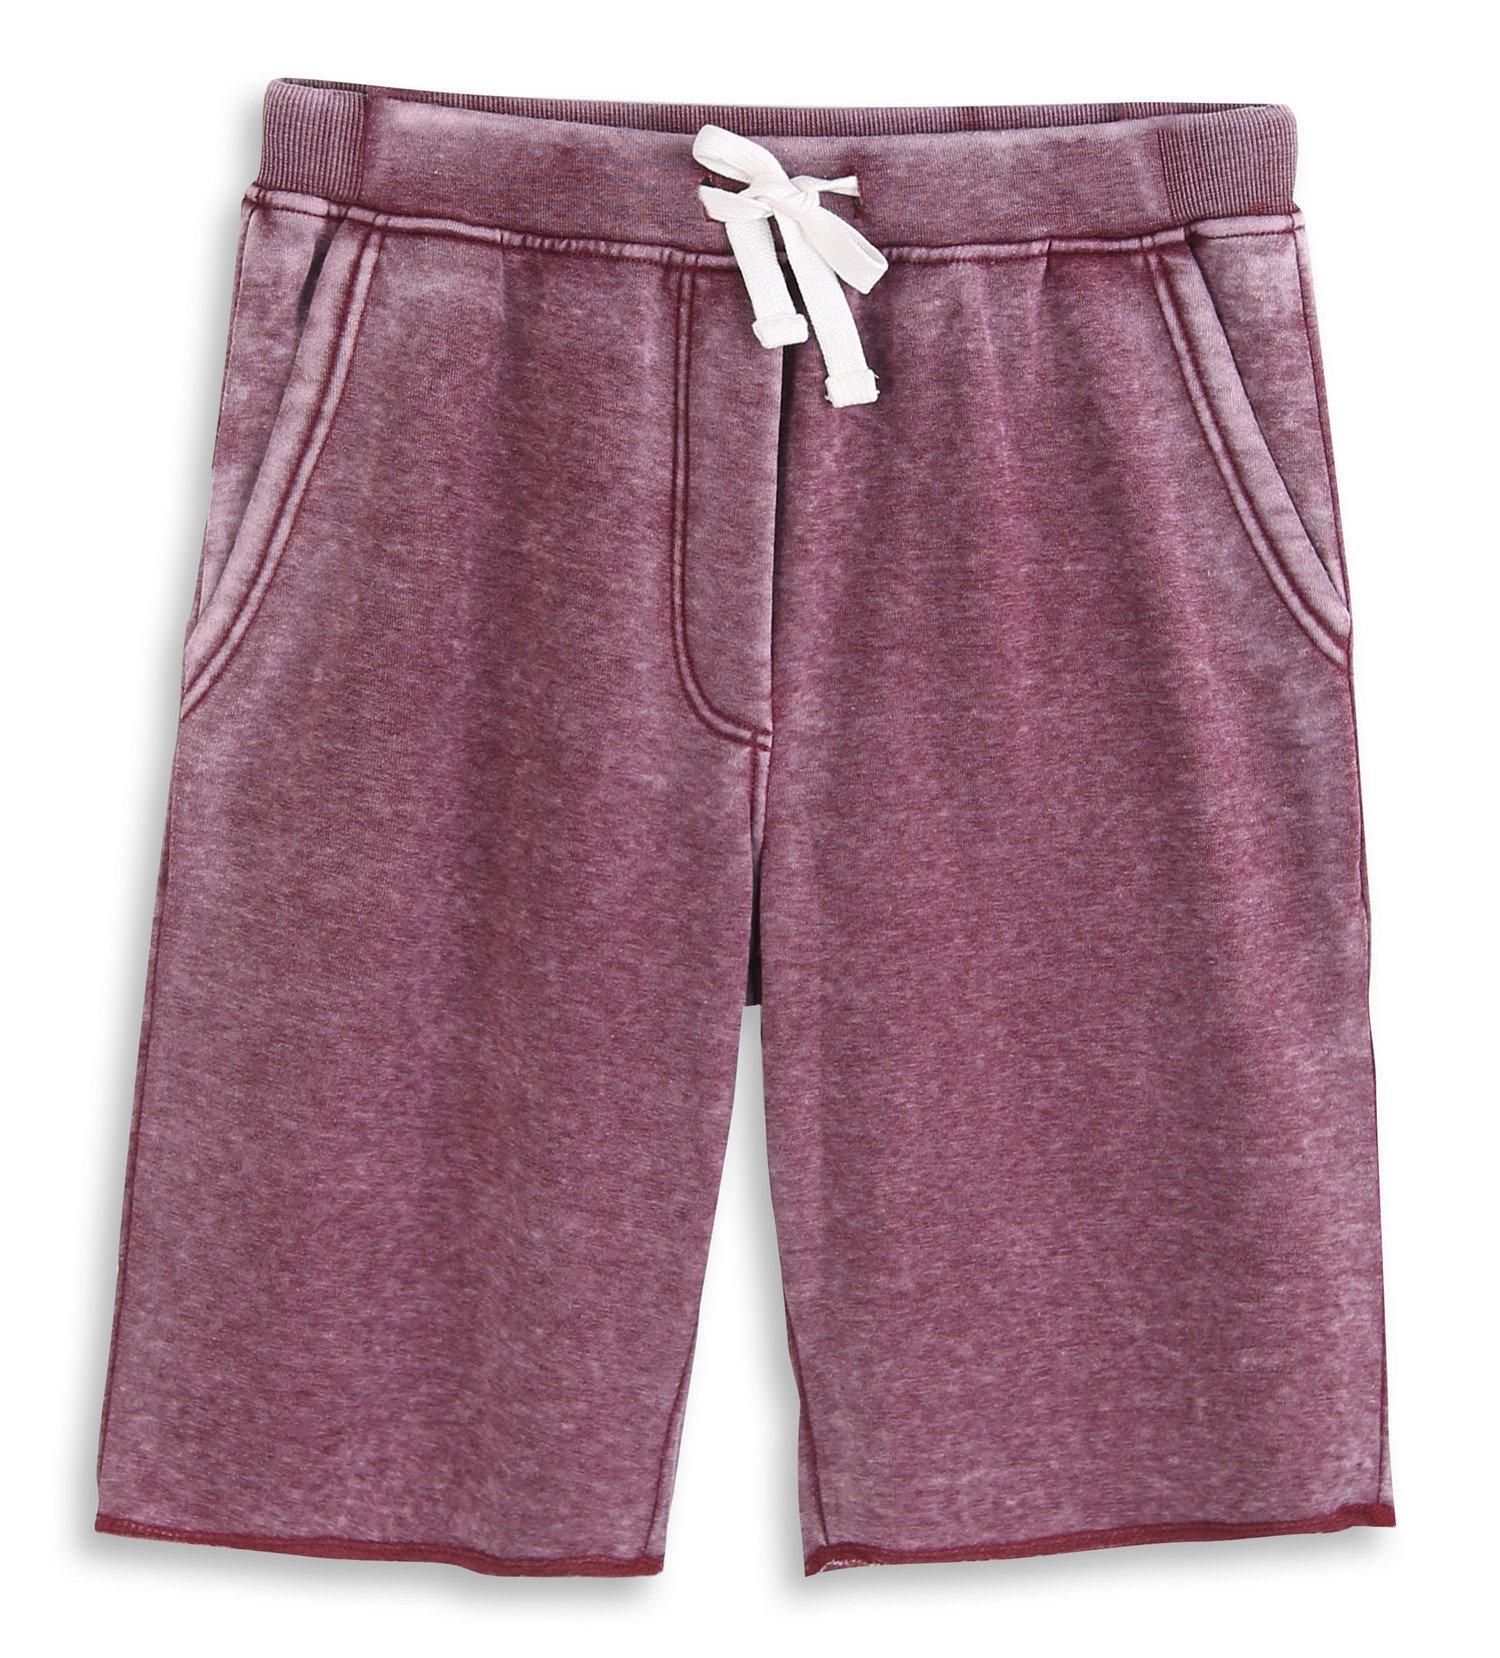 HARBETH Men's Casual Soft Cotton Elastic Fleece Jogger Gym Active Pocket Shorts Burnout Wine XL